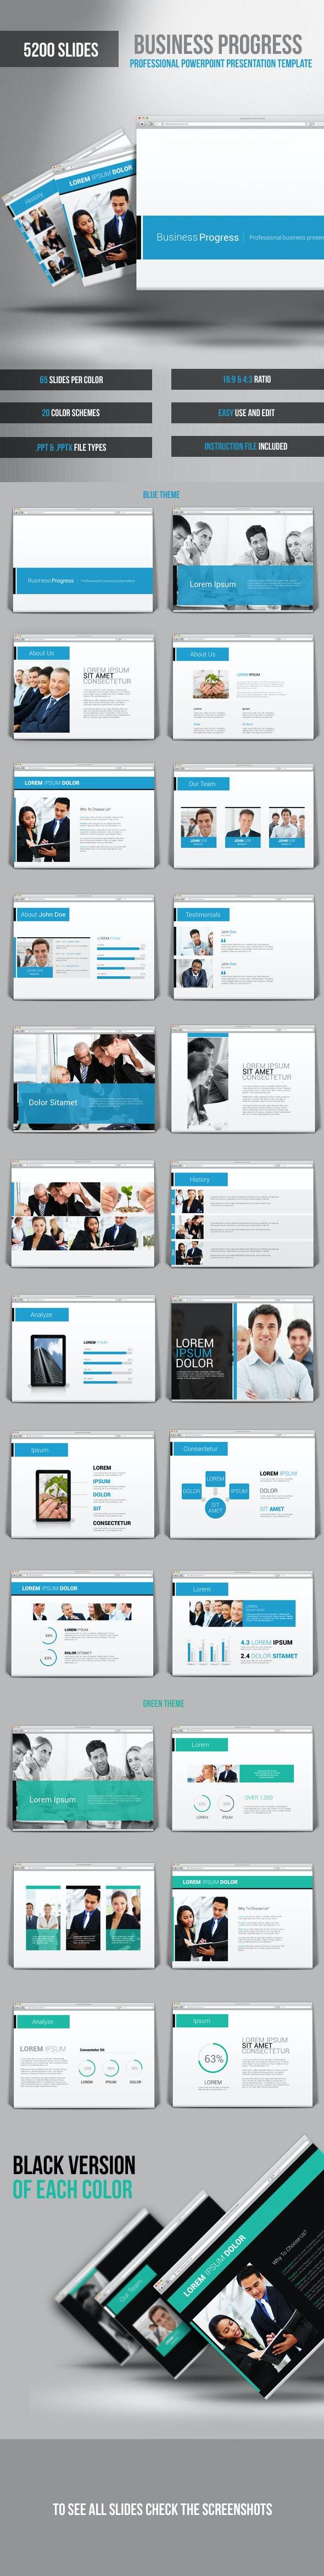 Business Progress Powerpoint Presentation Template - PowerPoint Templates Presentation Templates